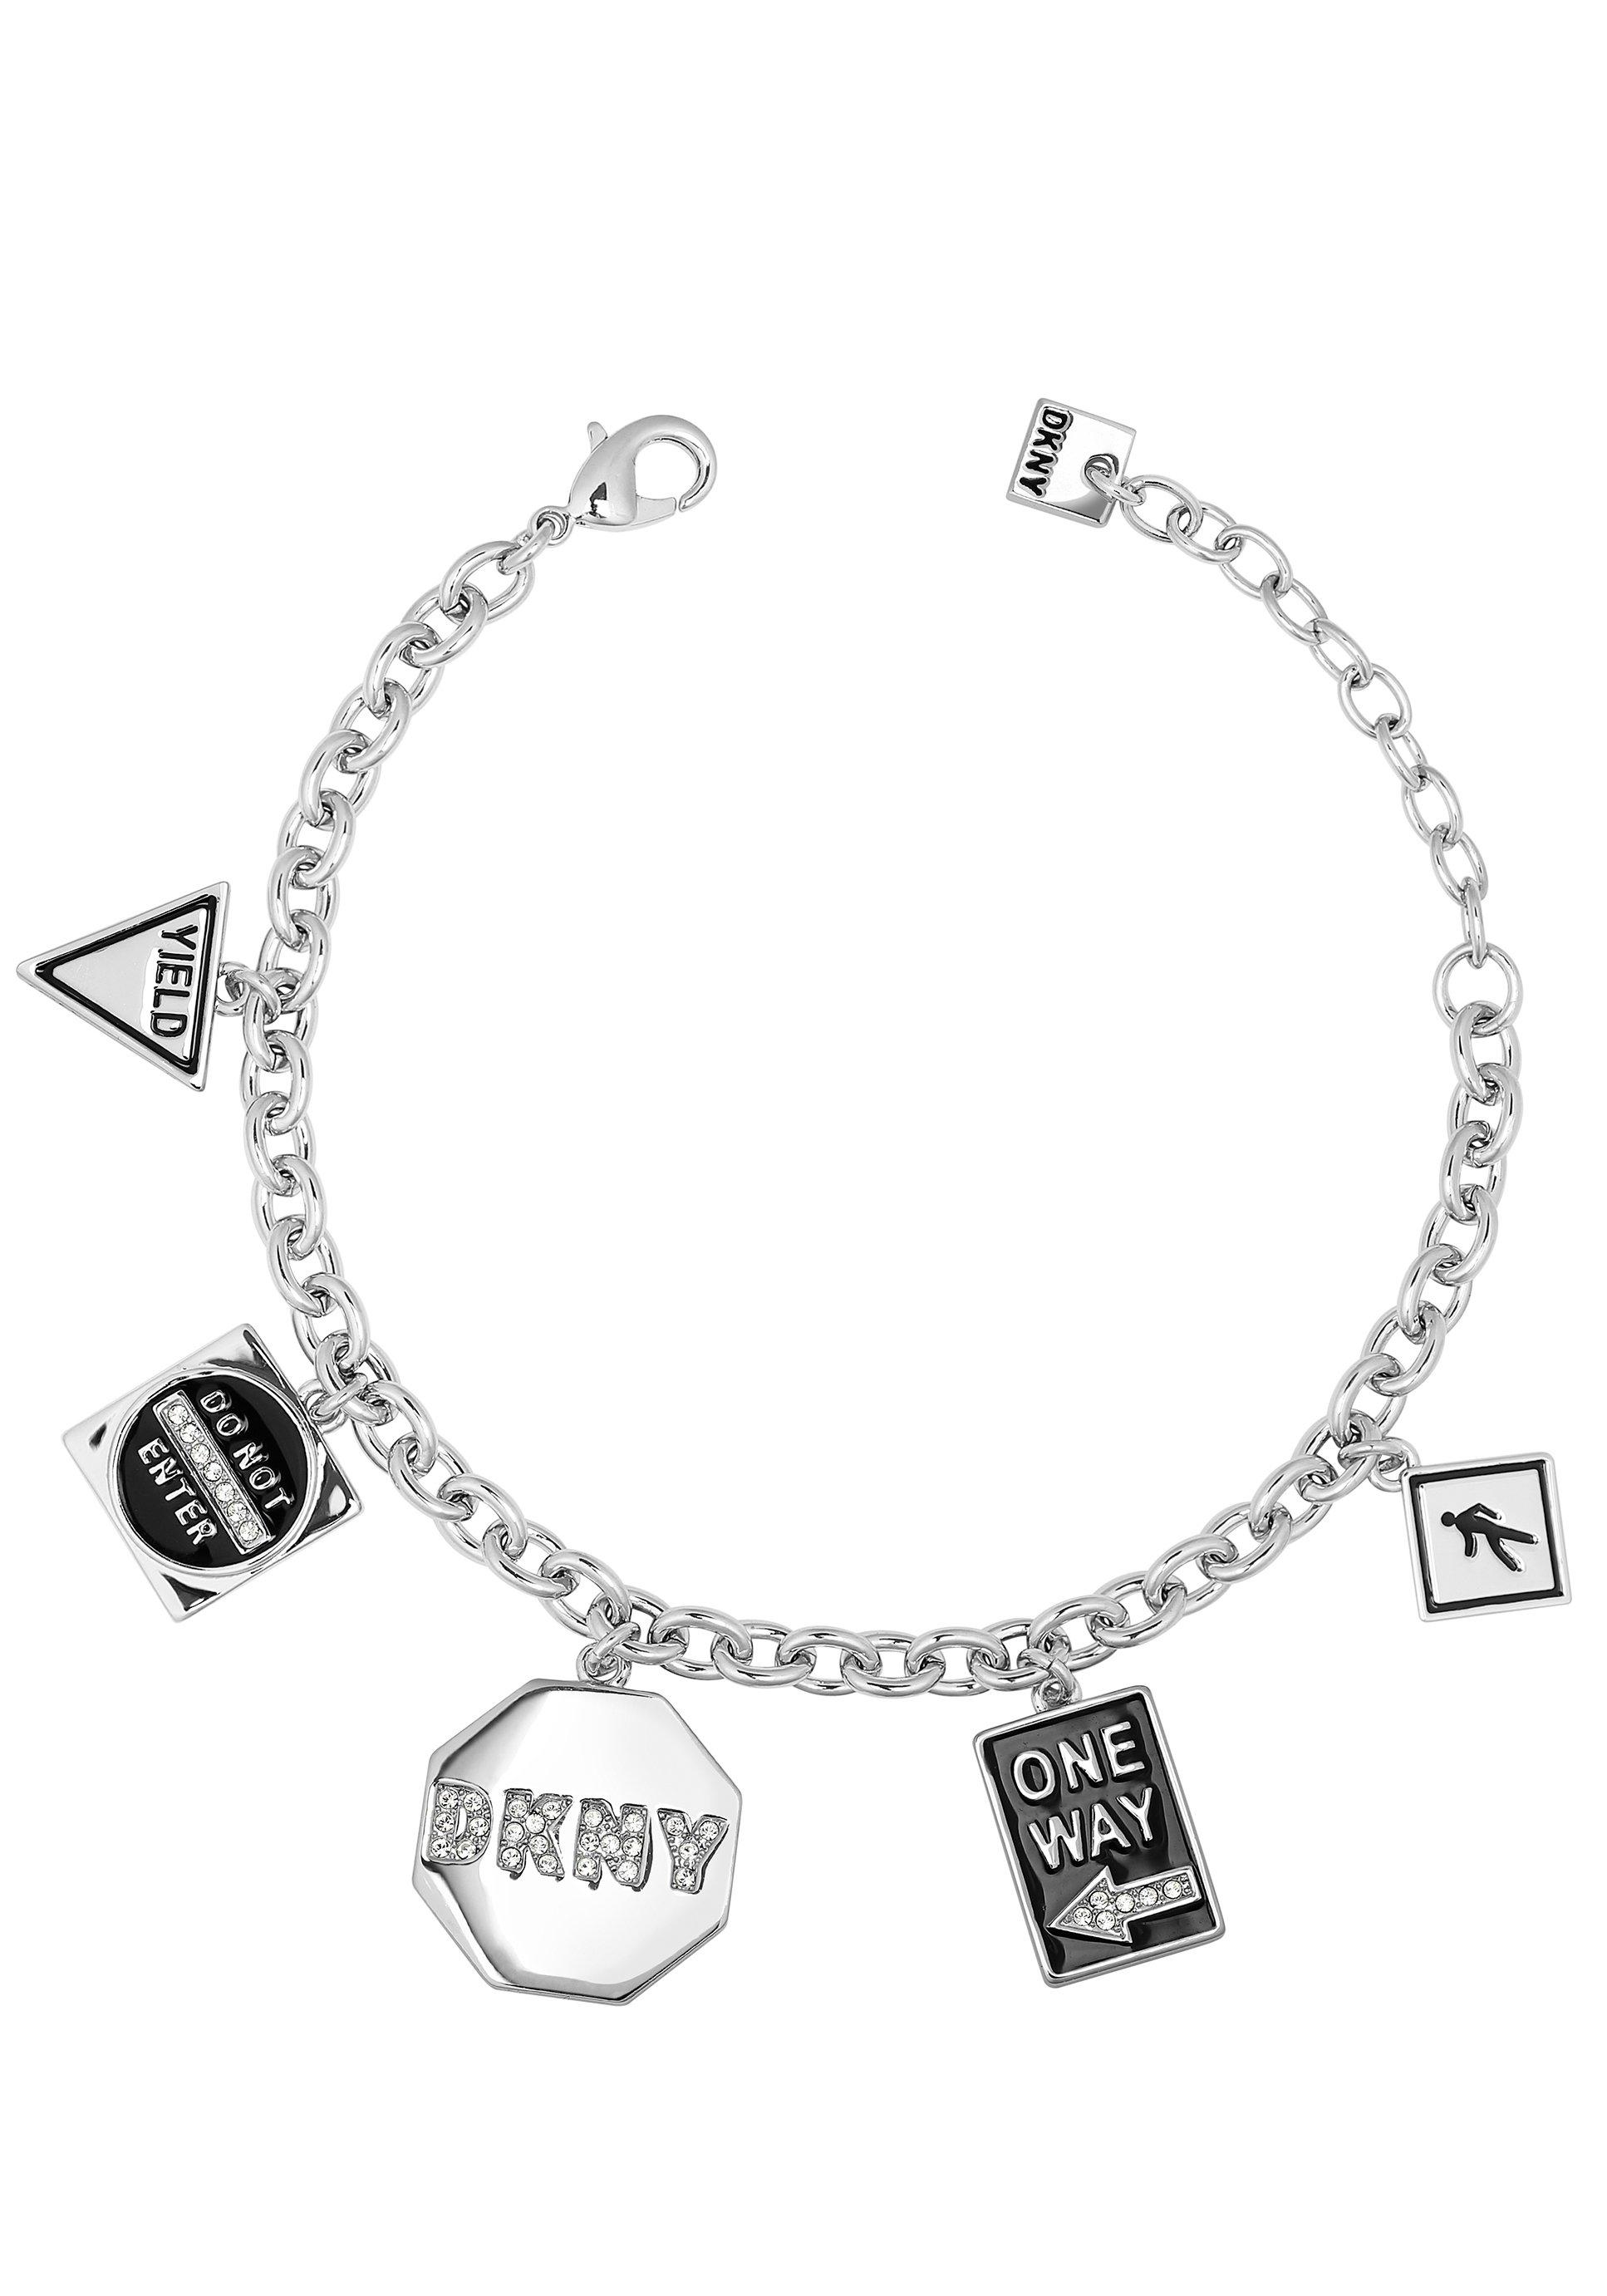 DKNY armband NYC Street Sign Charm BR (RH), 5547984 met swarovski®-kristallen en email nu online bestellen